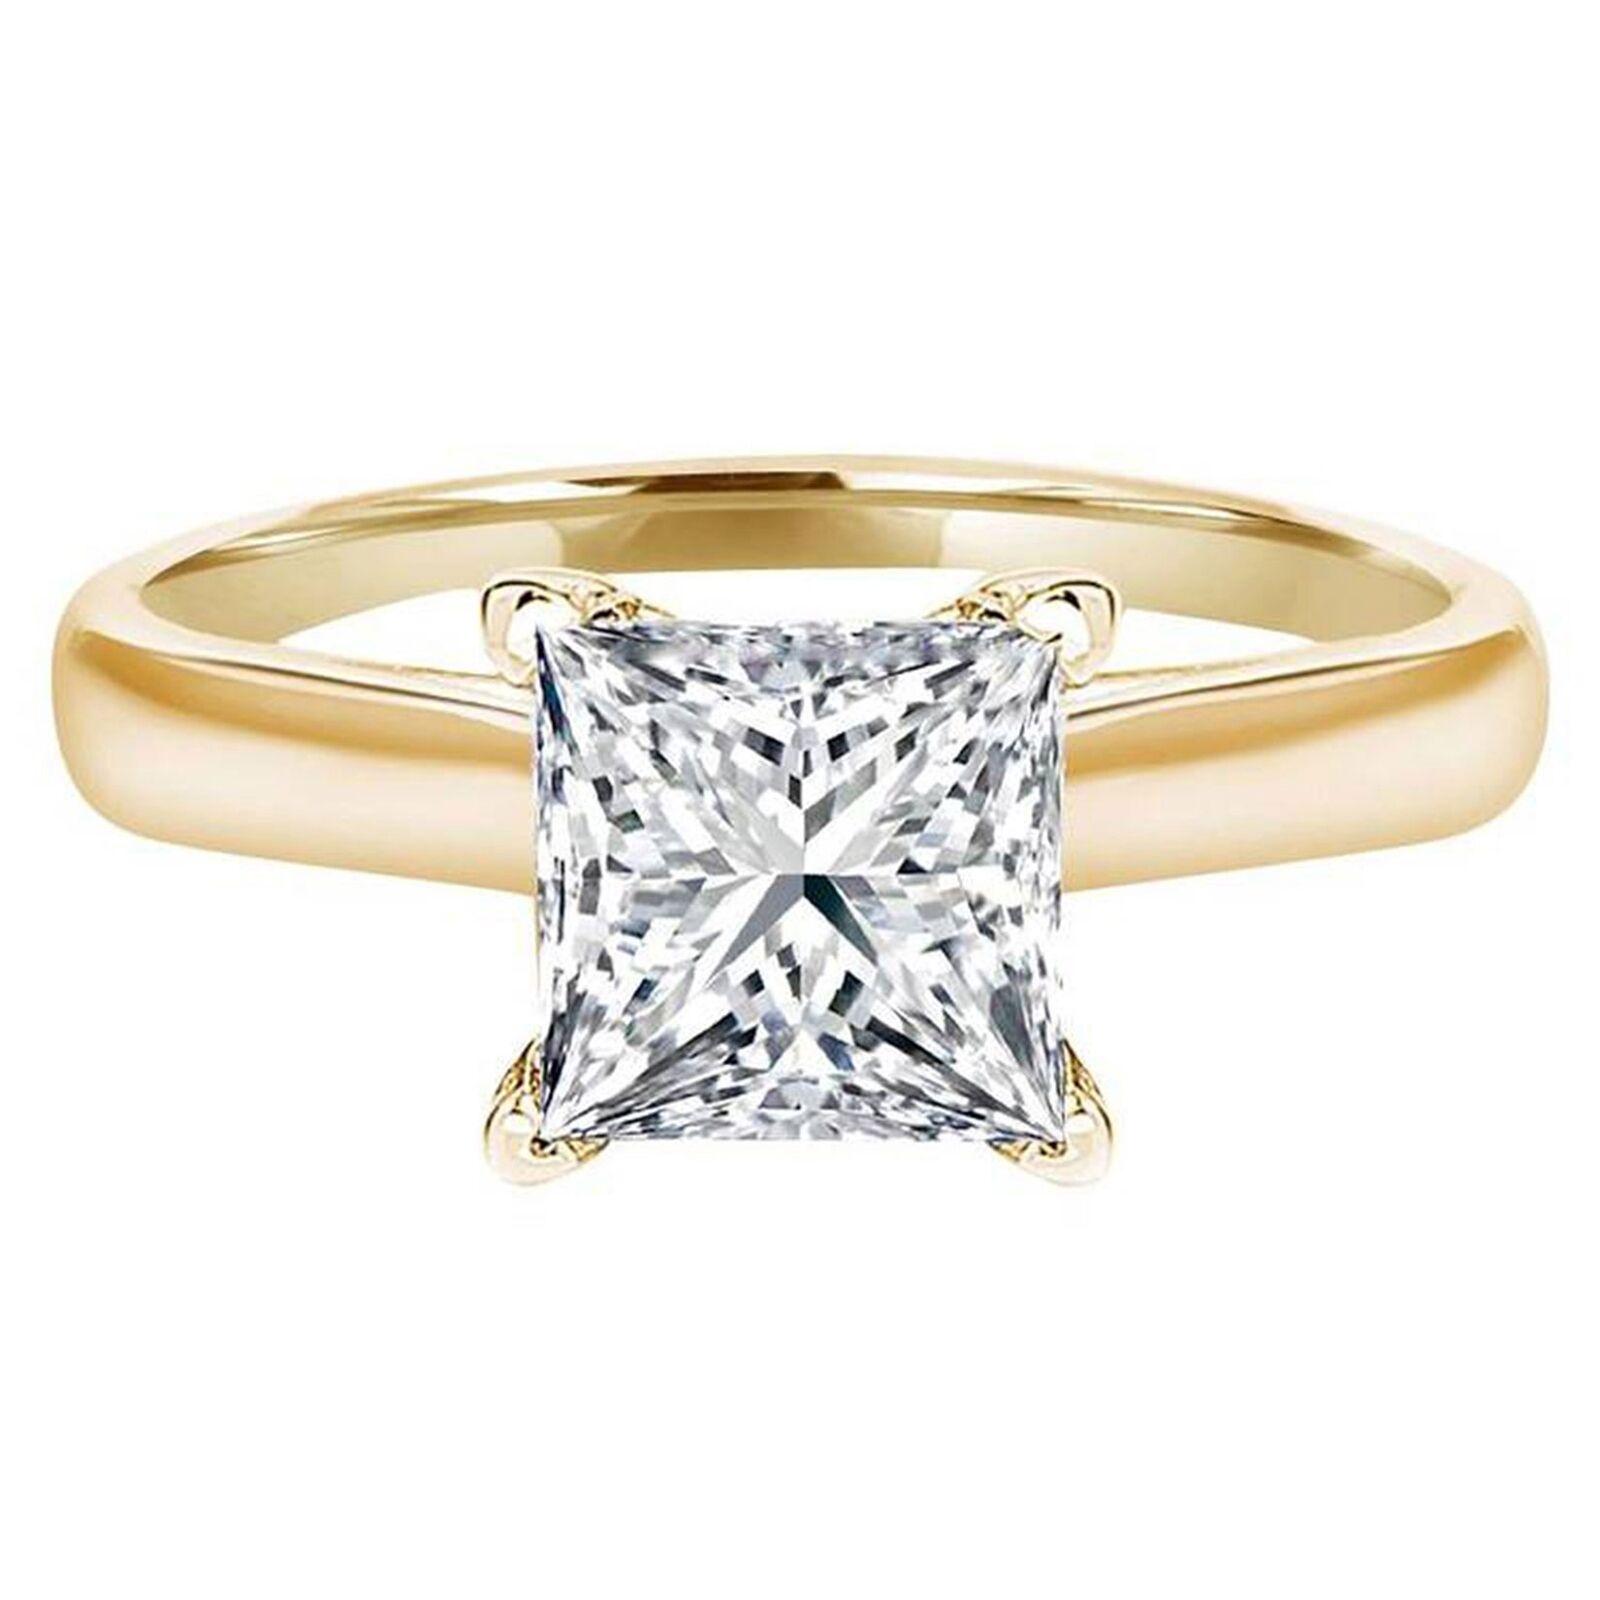 3.2ct Princess Cut Wedding Bridal Engagement Anniversary Ring 14k Yellow gold